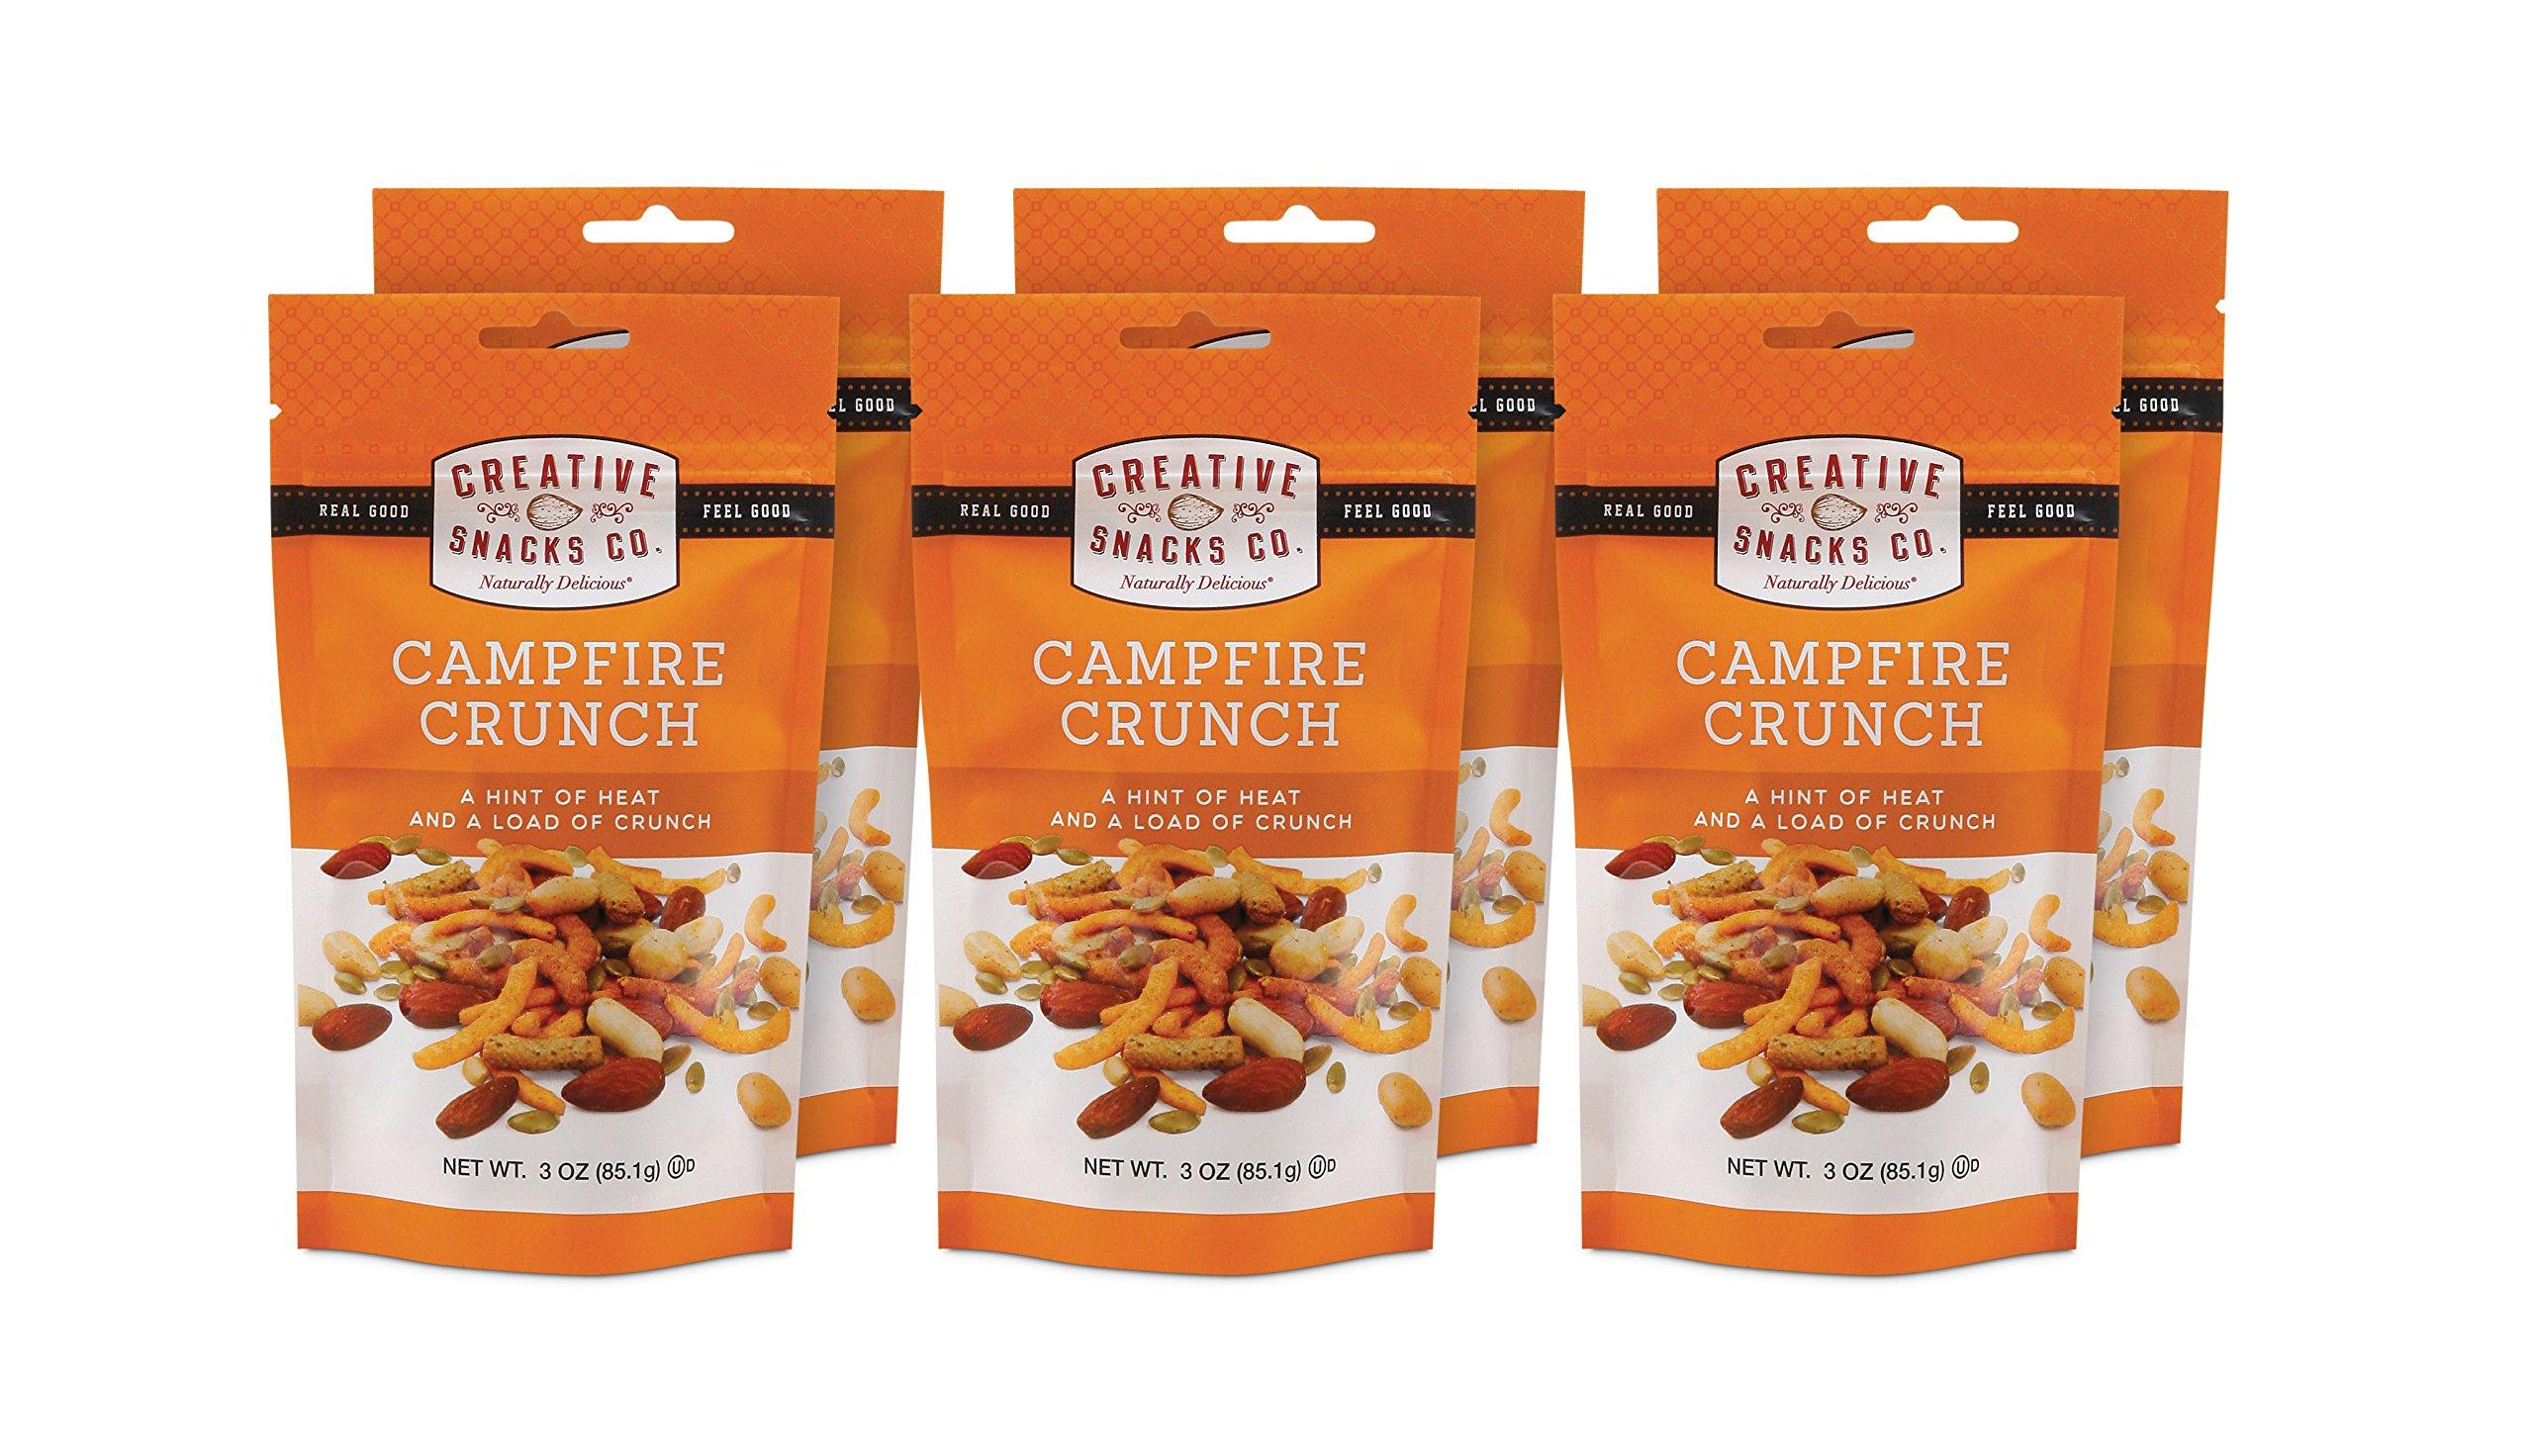 Creative Snacks Campfire Crunch Snack Bag, Net Wt. 3 oz. (Pack of 6)